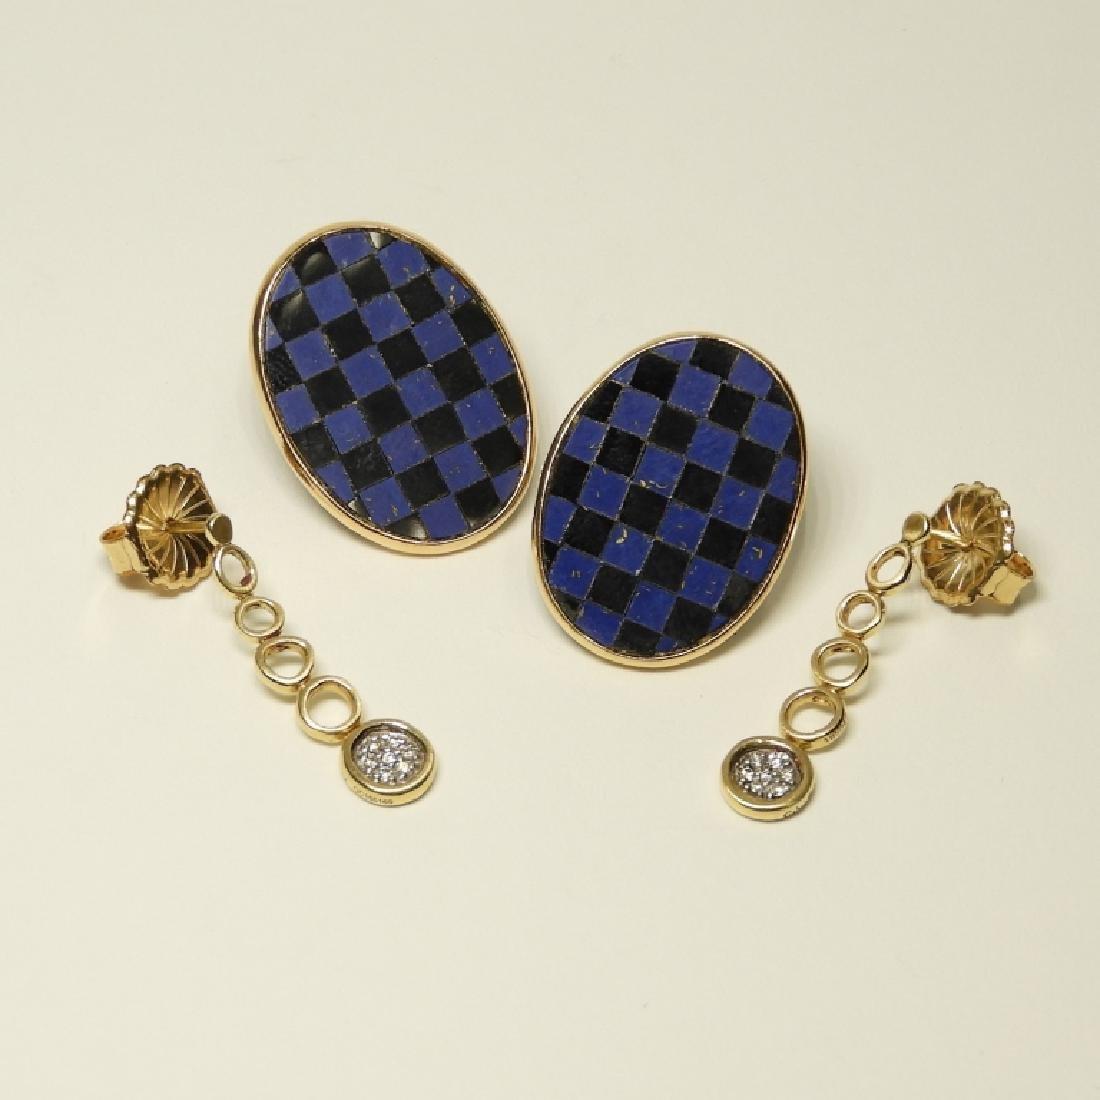 2 Pair 14K Gold Earrings Diamonds Lapis Onyx